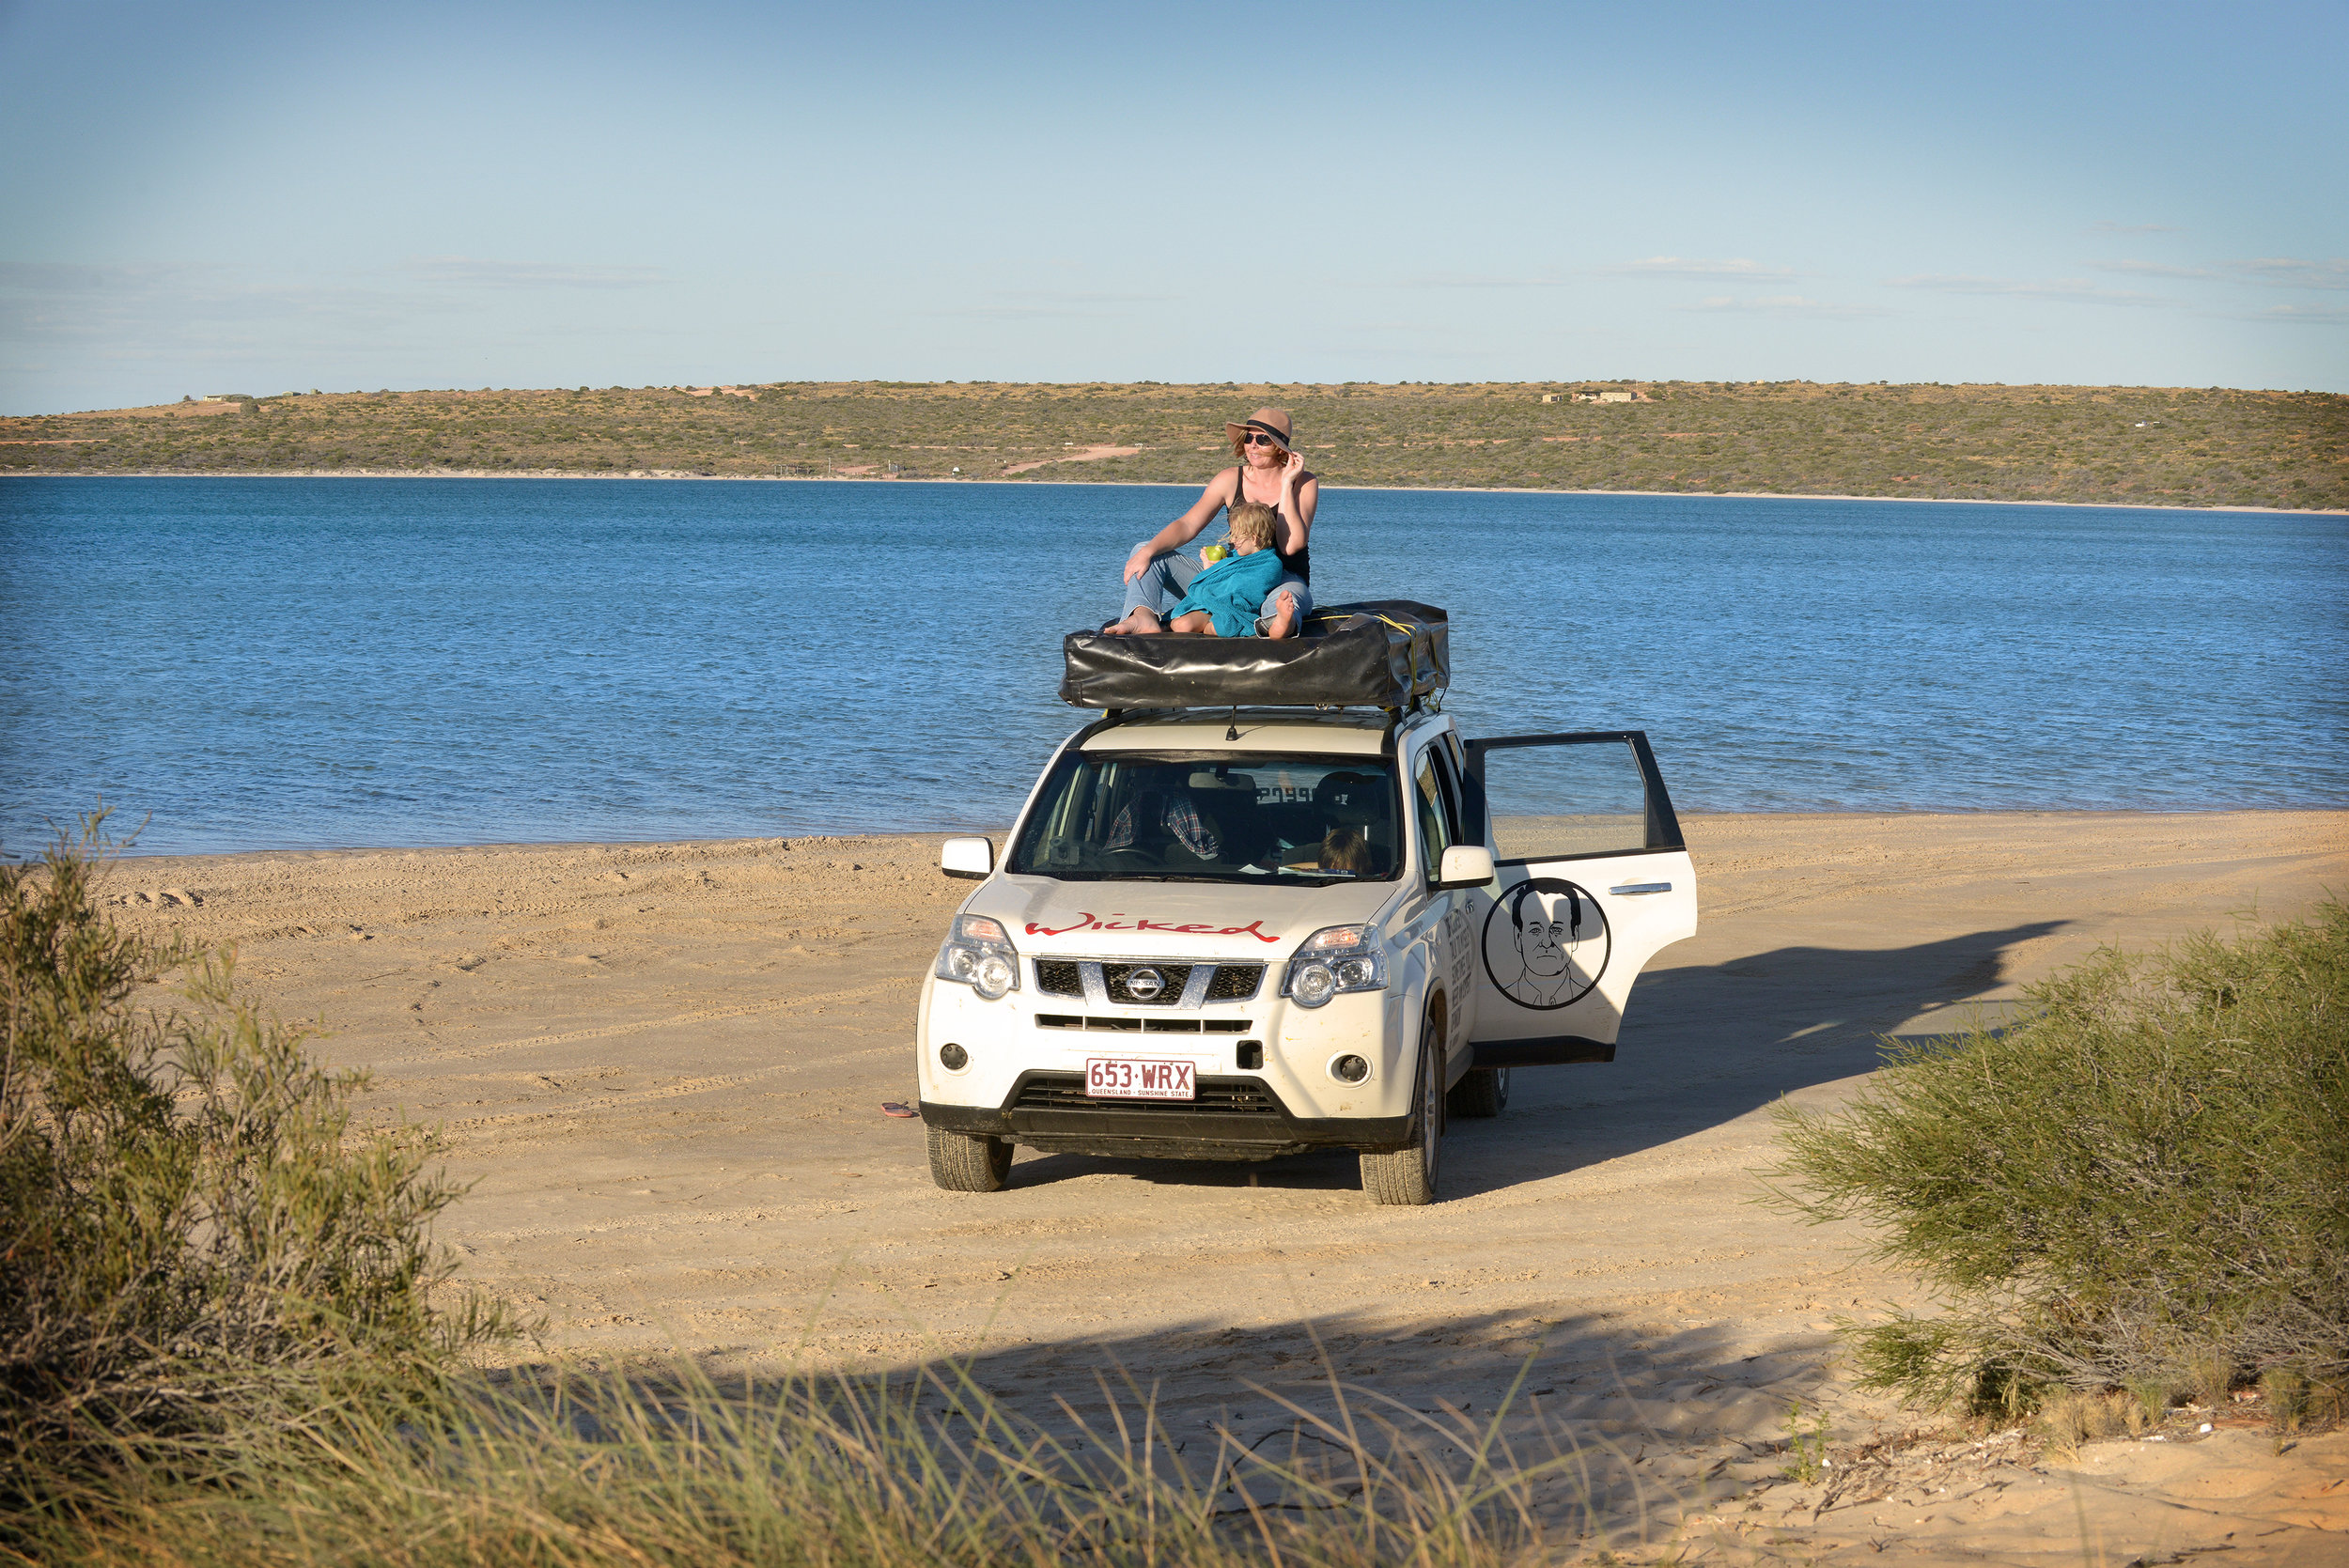 Roadtrip, automatka, matka, matkablogi, Australia, meri